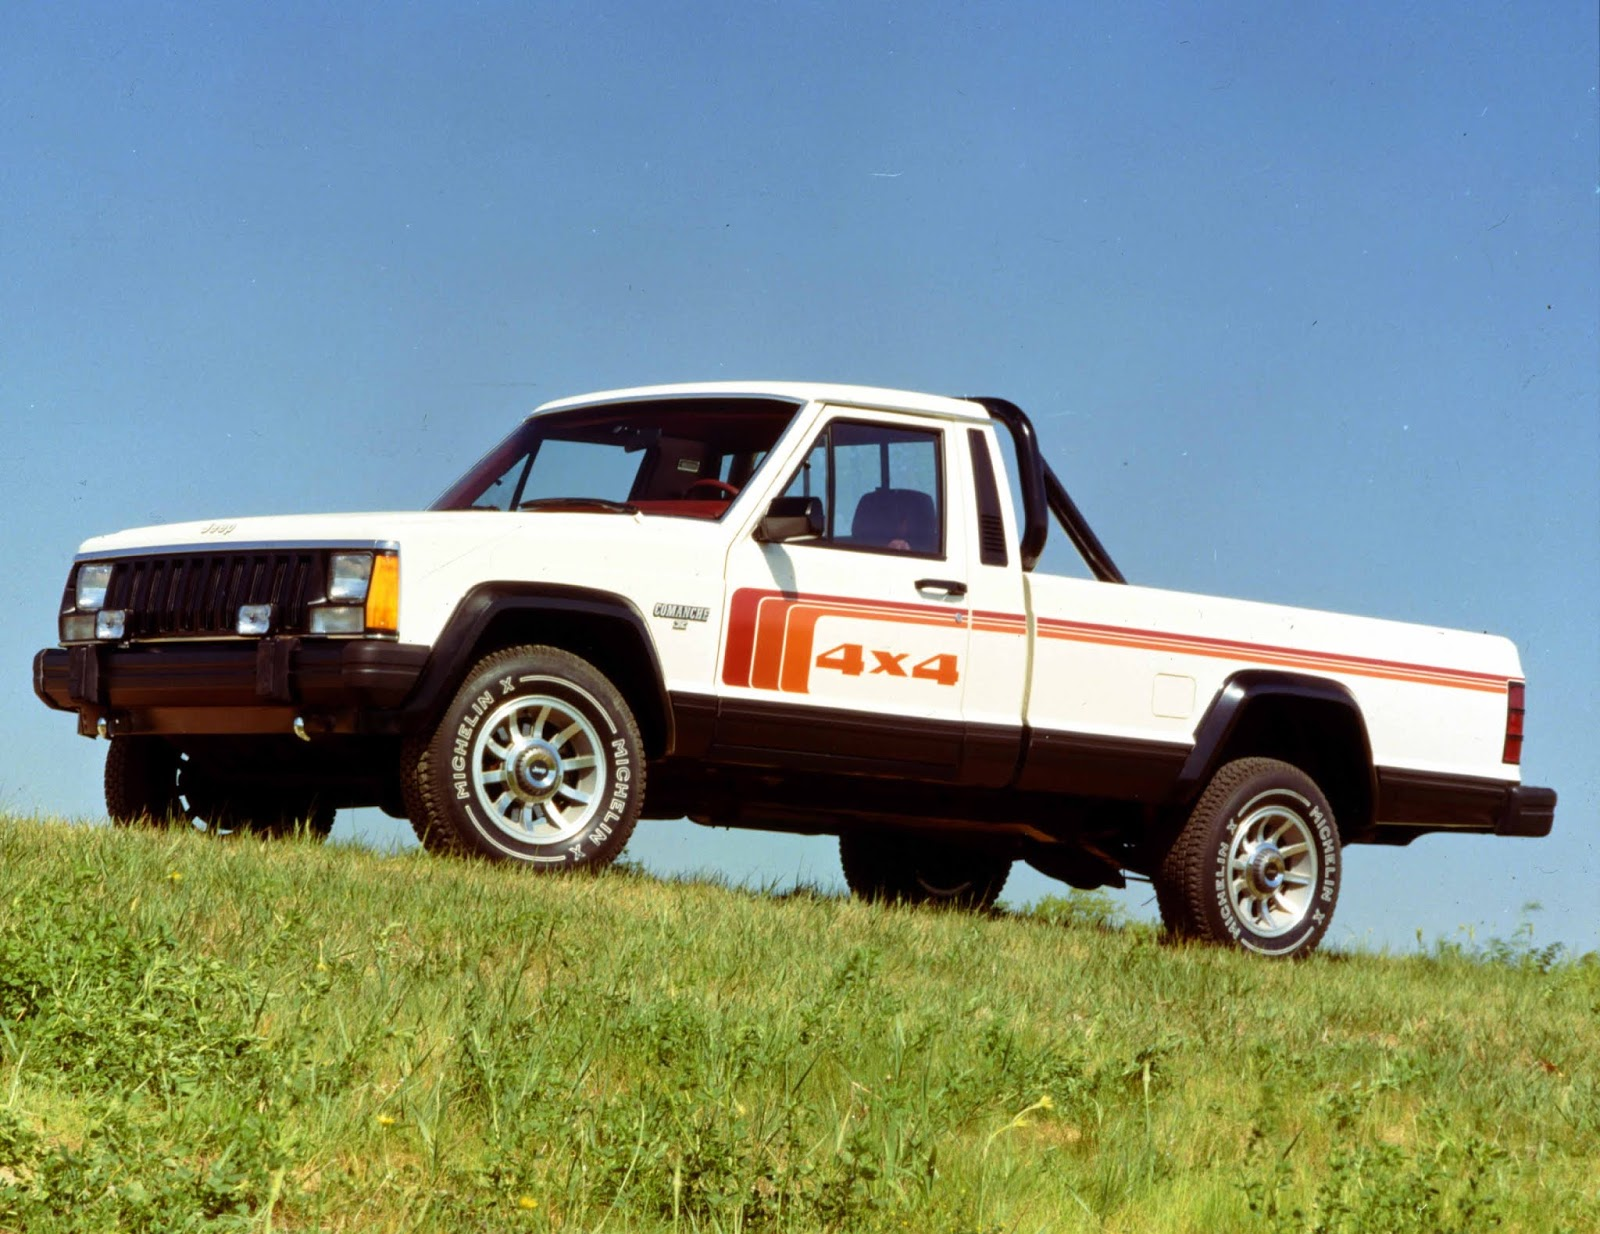 1986 Jeep Comanche 2 To Jeep Gladiator, έρχεται να αλλάξει τα δεδομένα στην κατηγορία των pick-up Gladiator, Jeep, Jeep Gladiator, zblog, ειδήσεις